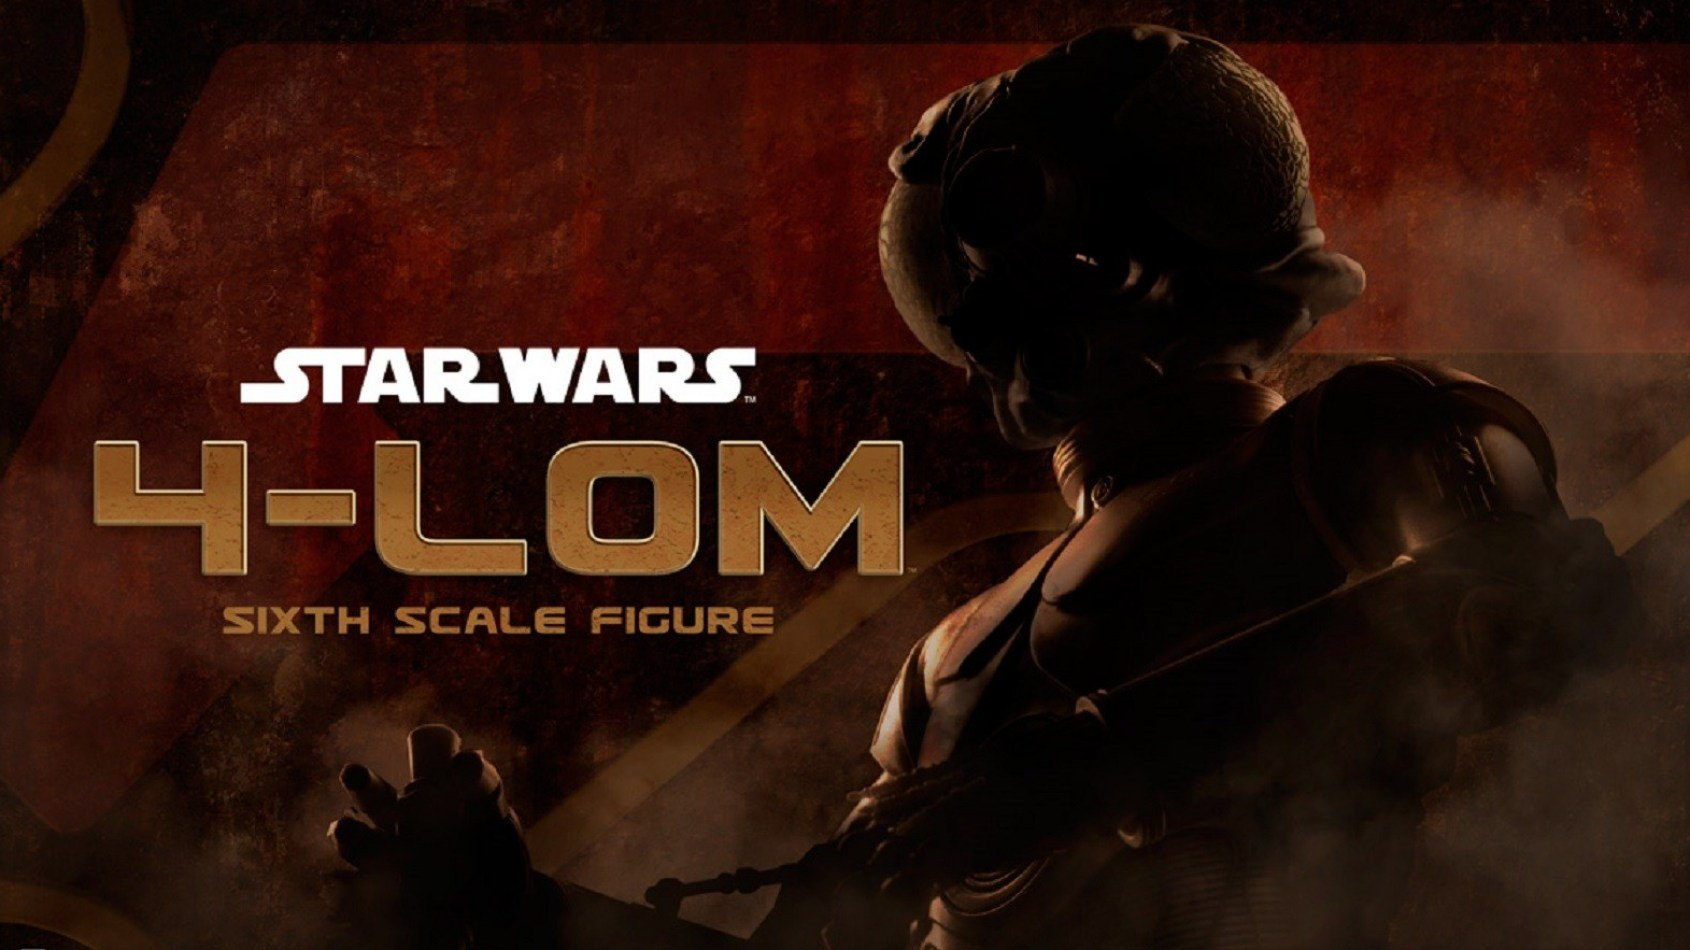 Sideshow 4-LOM Sixth Scale Figure